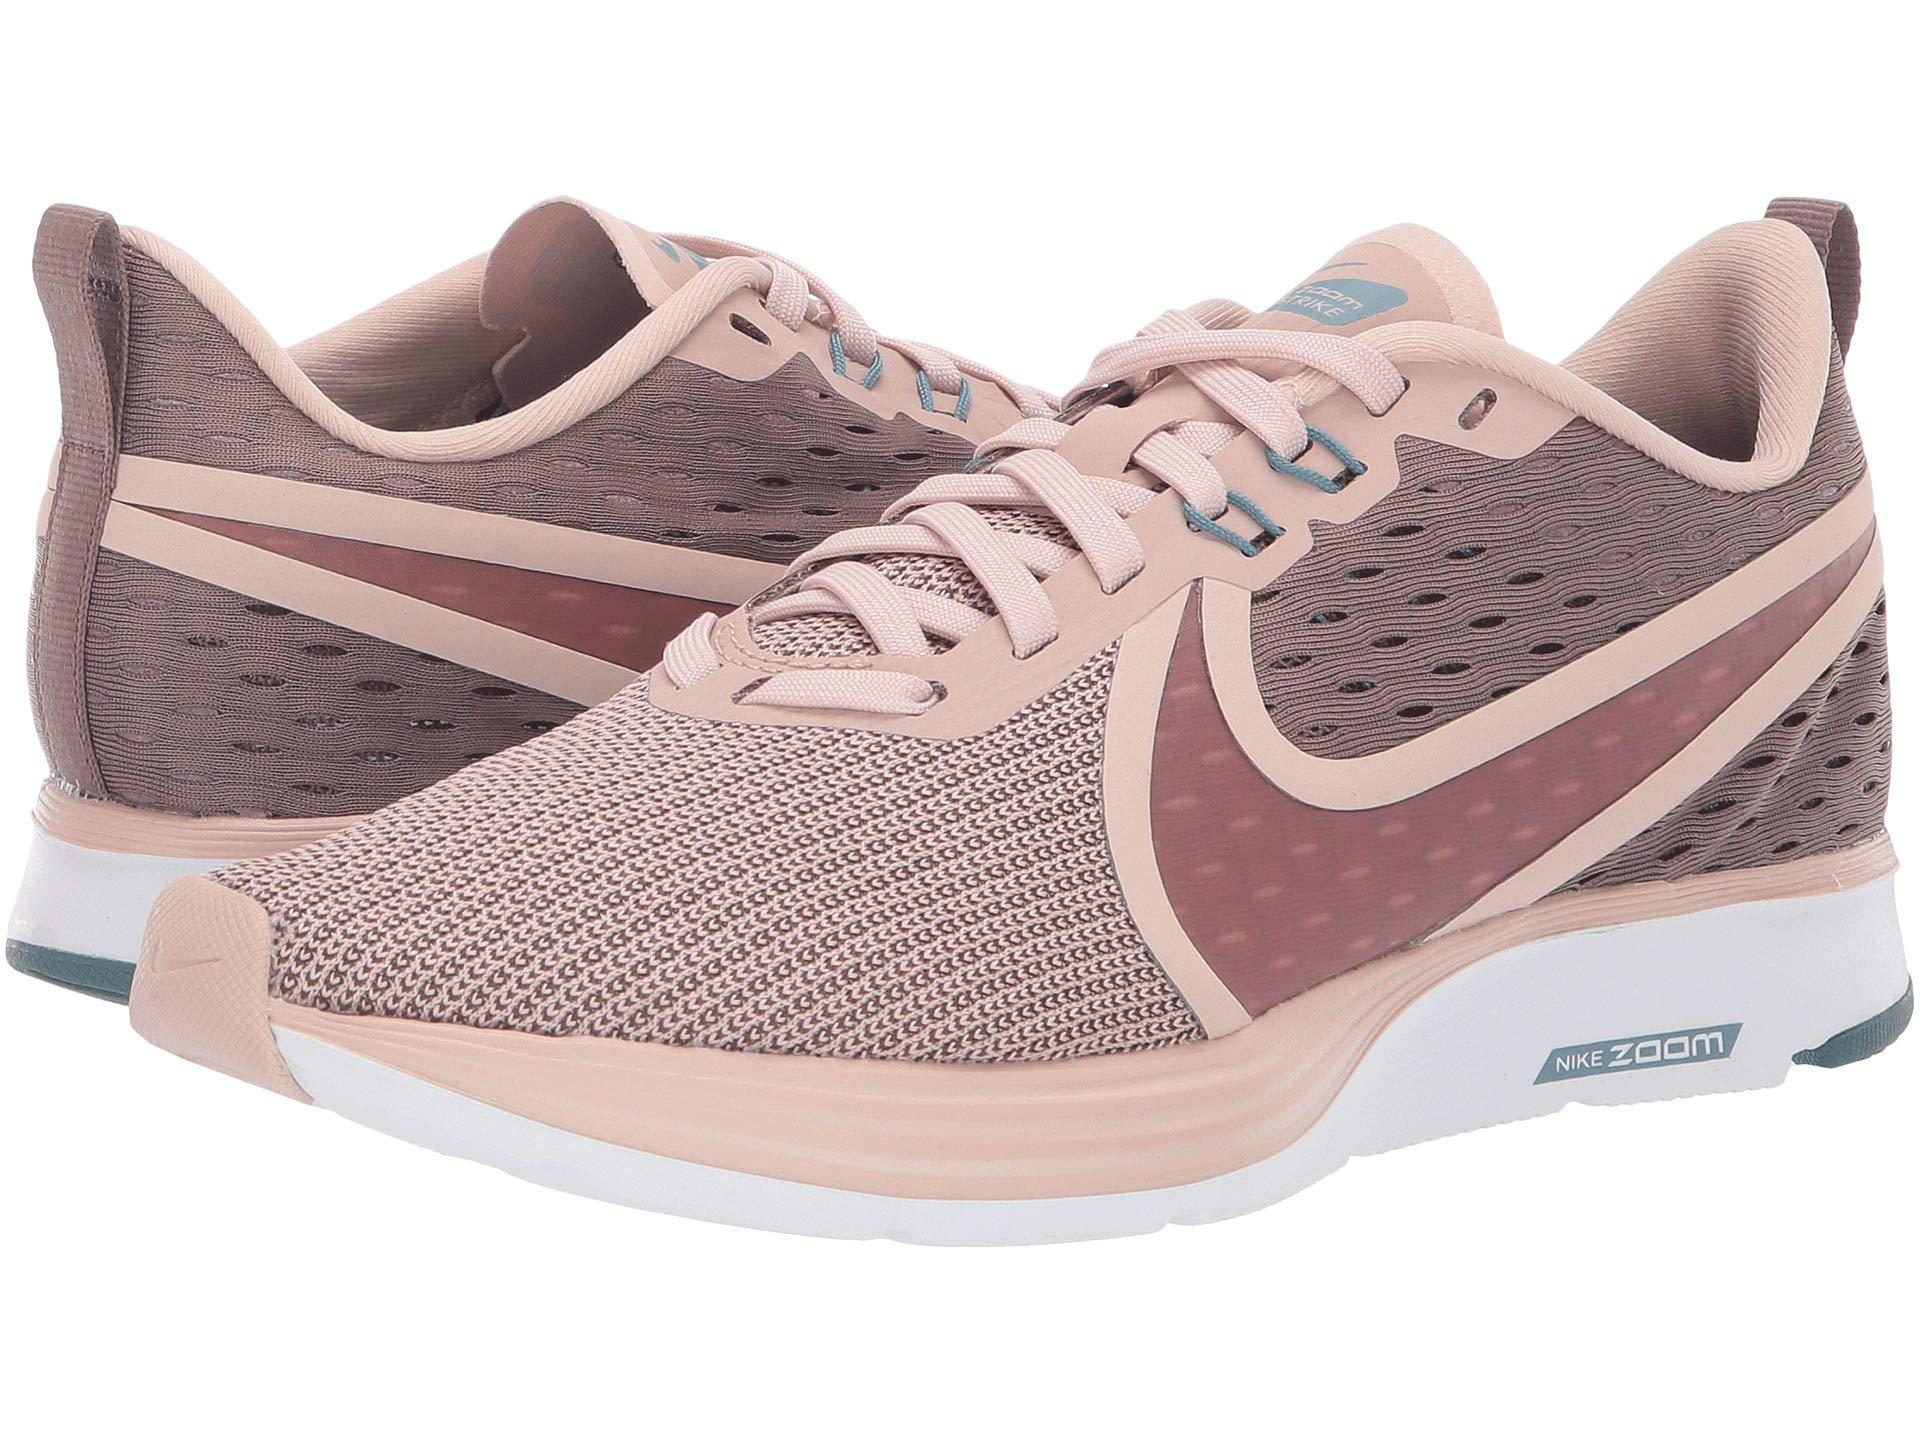 e2748fe1e119f Nike. Zoom Strike 2 (gunsmoke oil Grey lava Glow white) Women s Running  Shoes